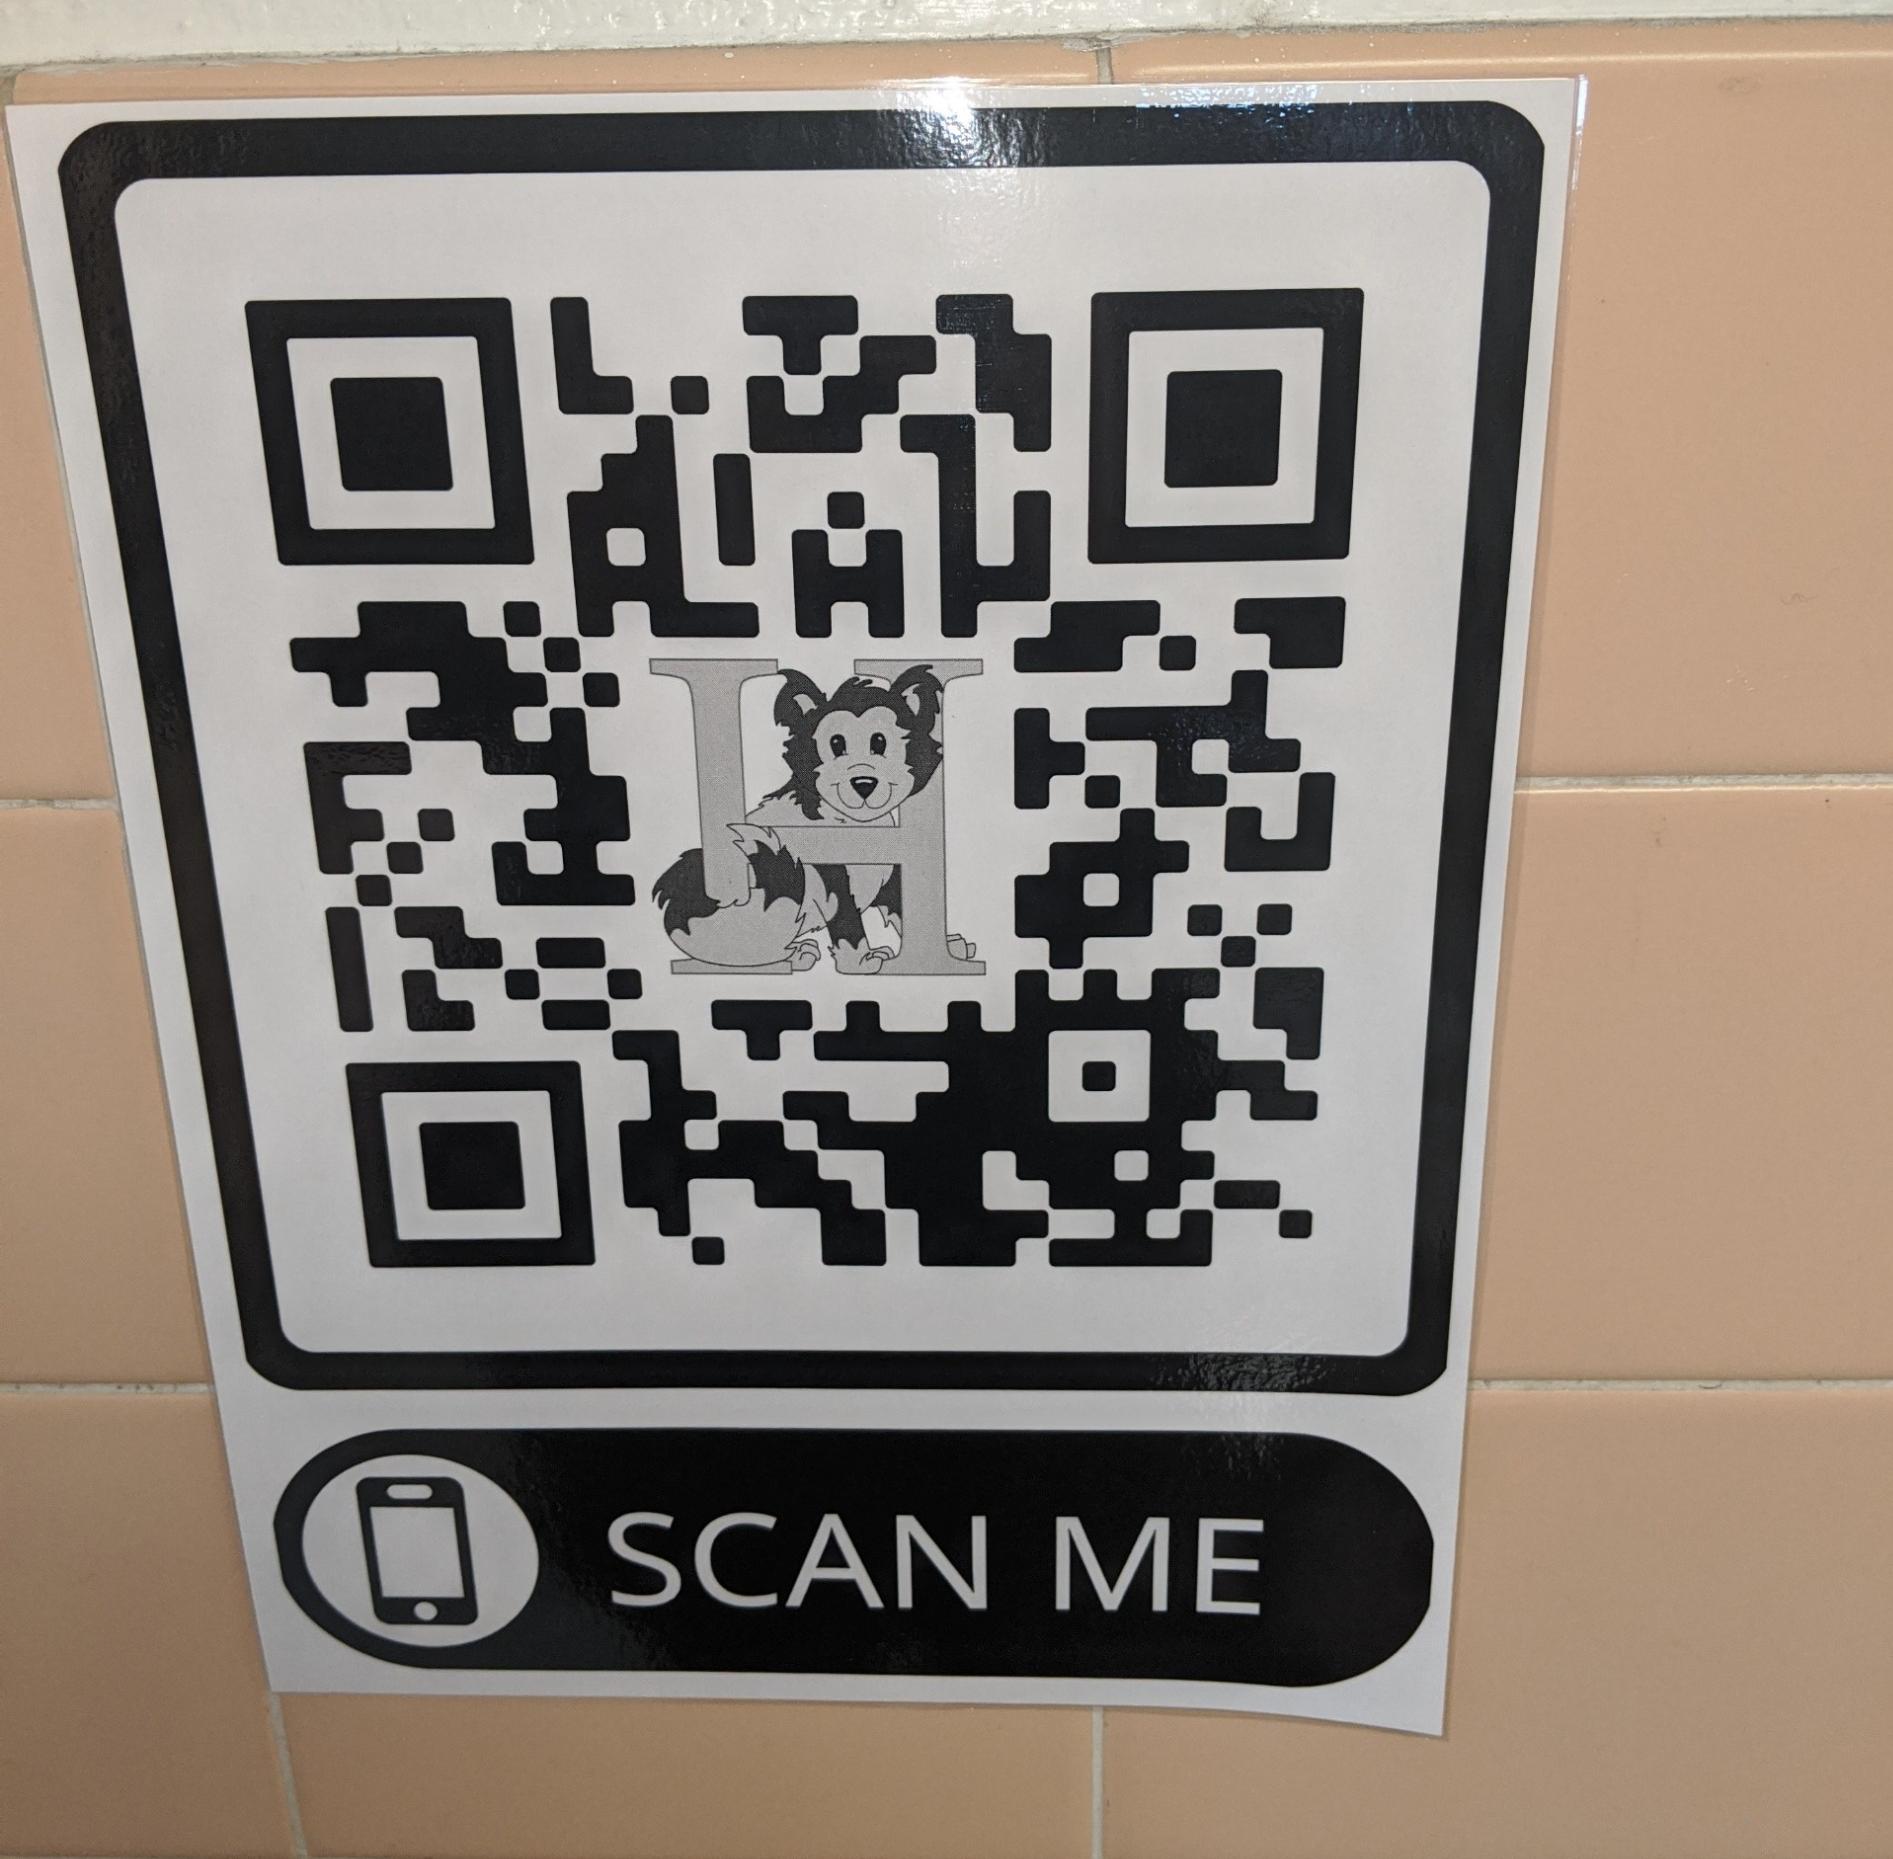 scan me